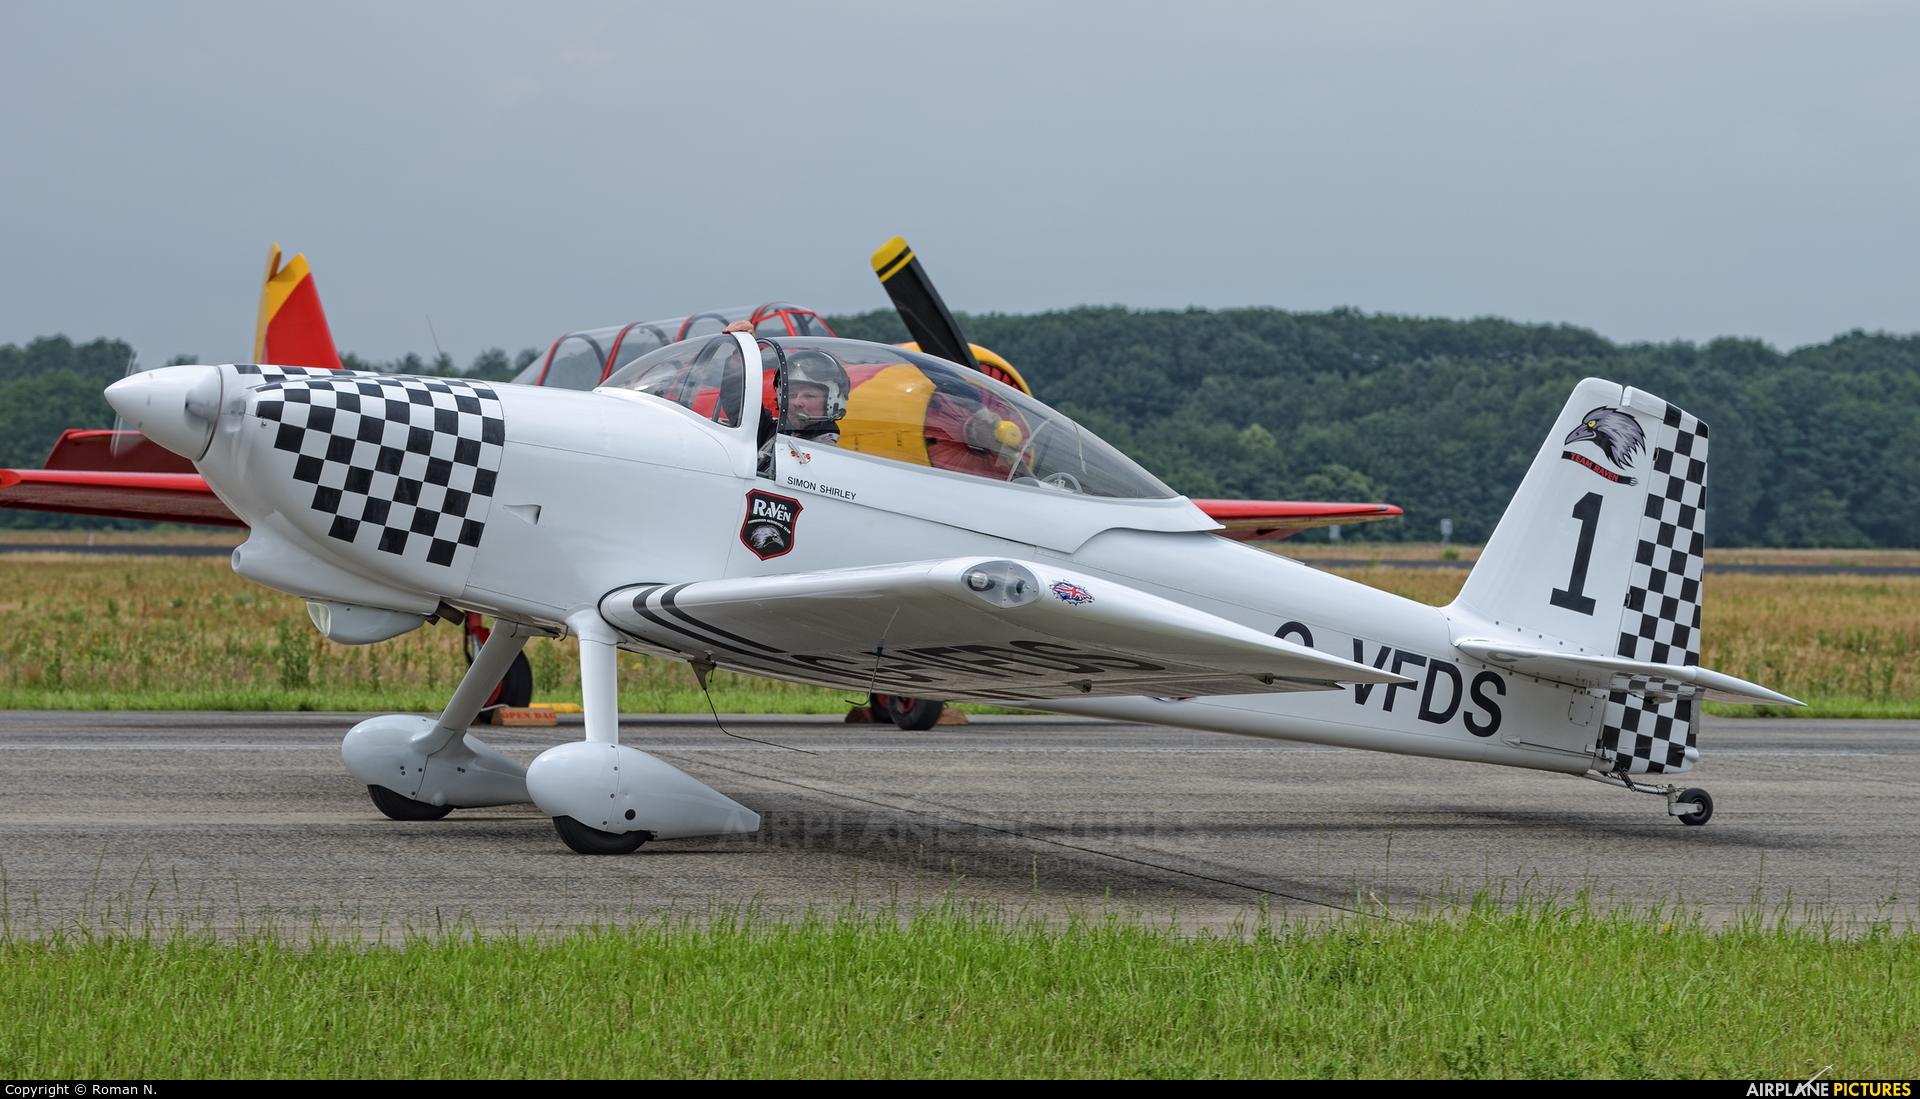 Team Raven G-VFDS aircraft at Uden - Volkel